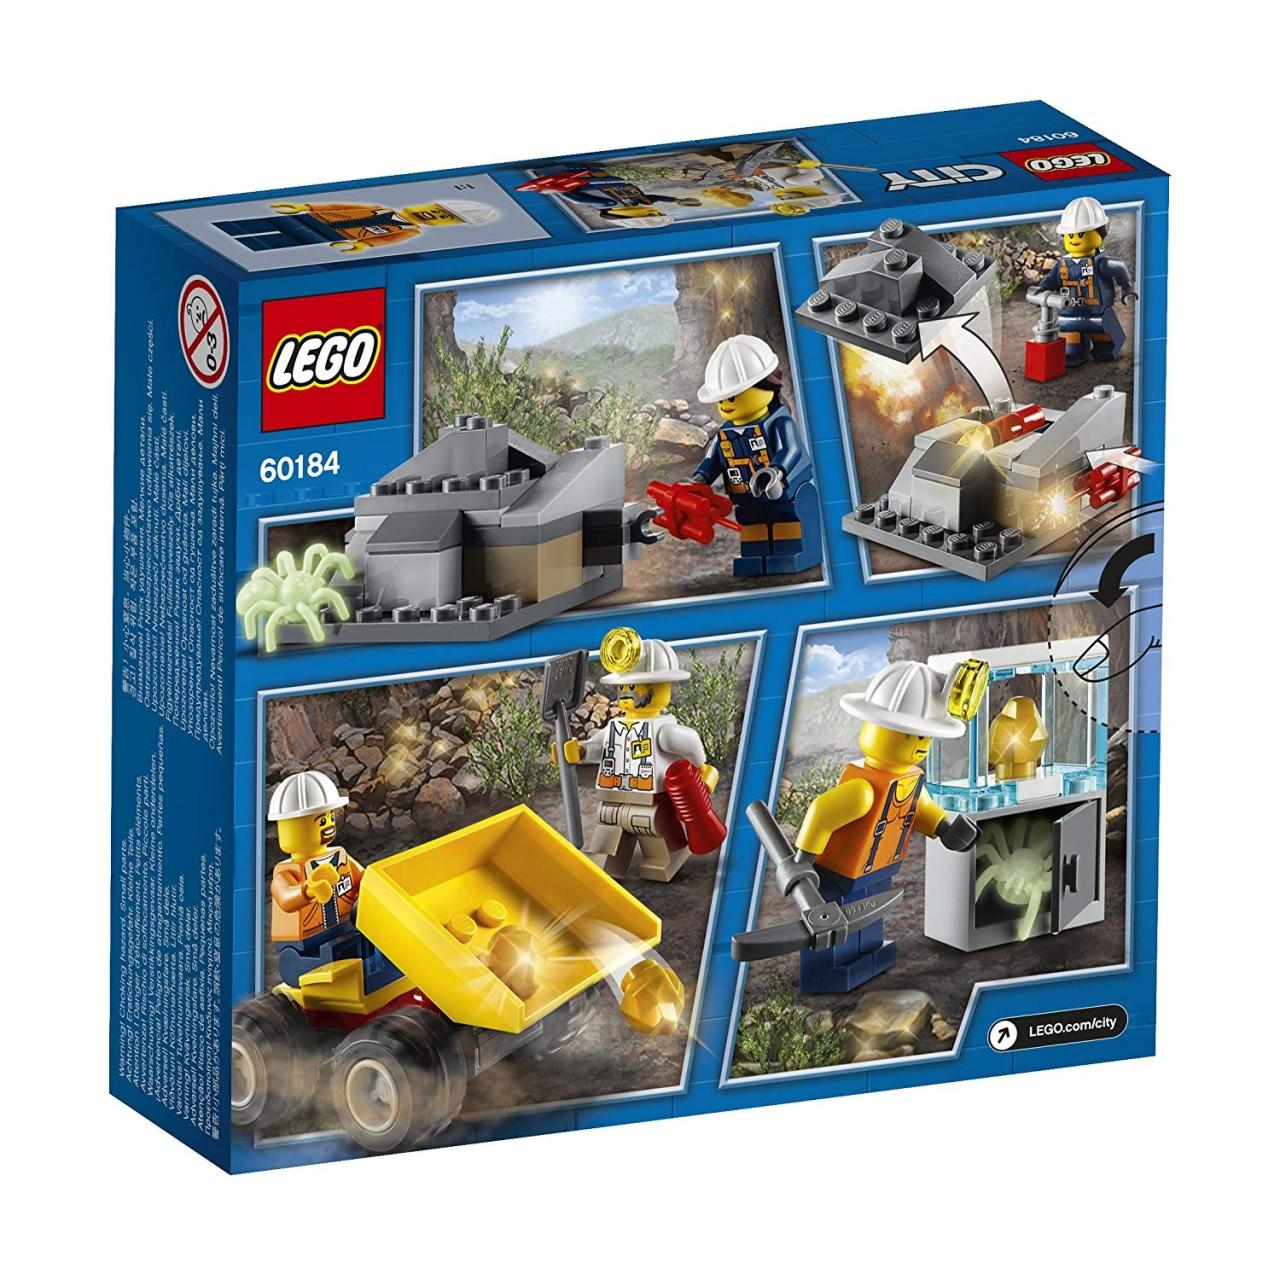 LEGO CITY 60184 Bergbauteam